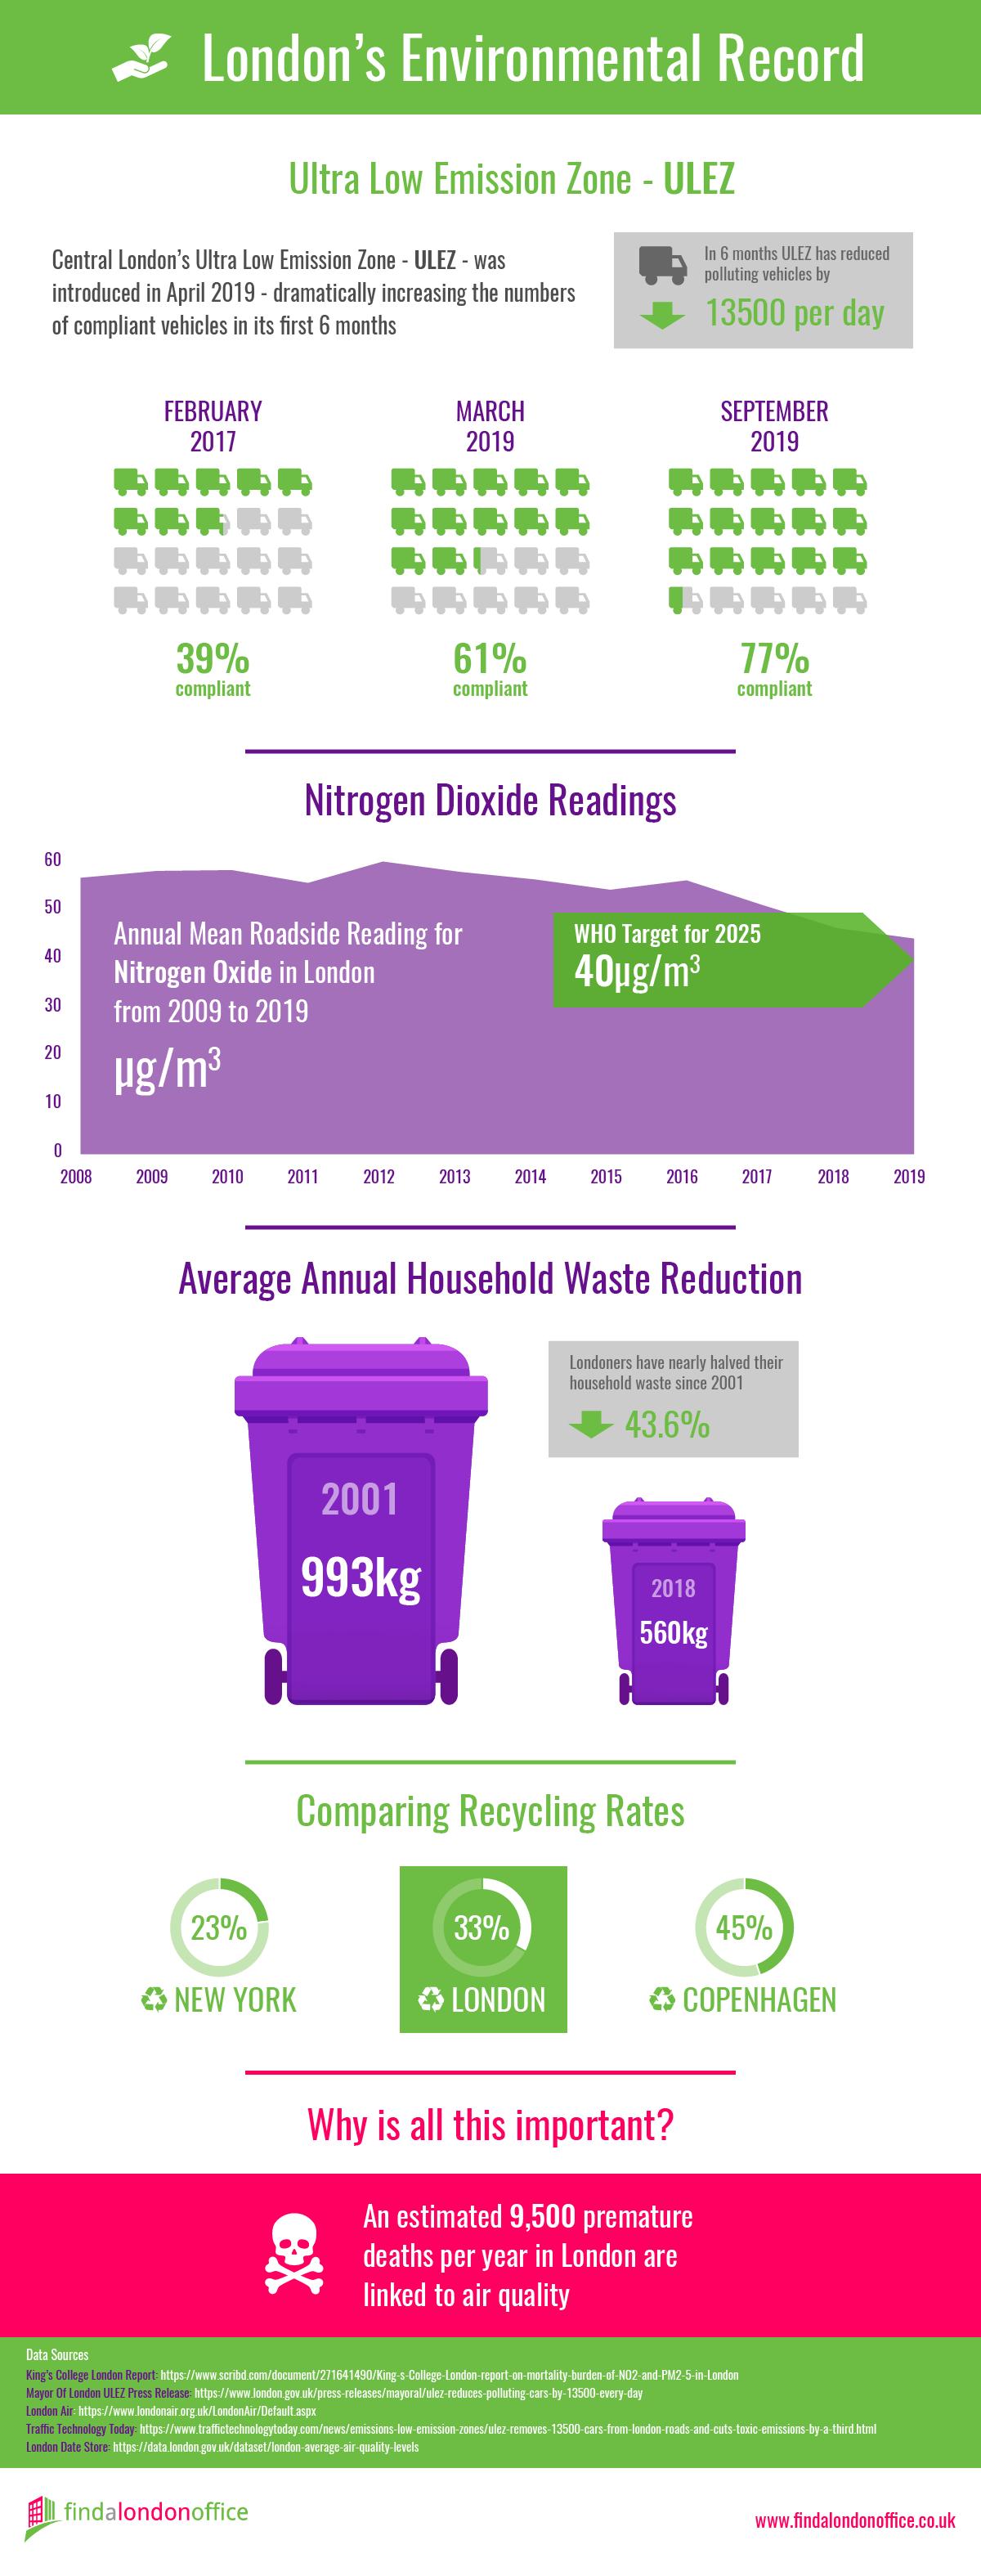 London's Environmental Record